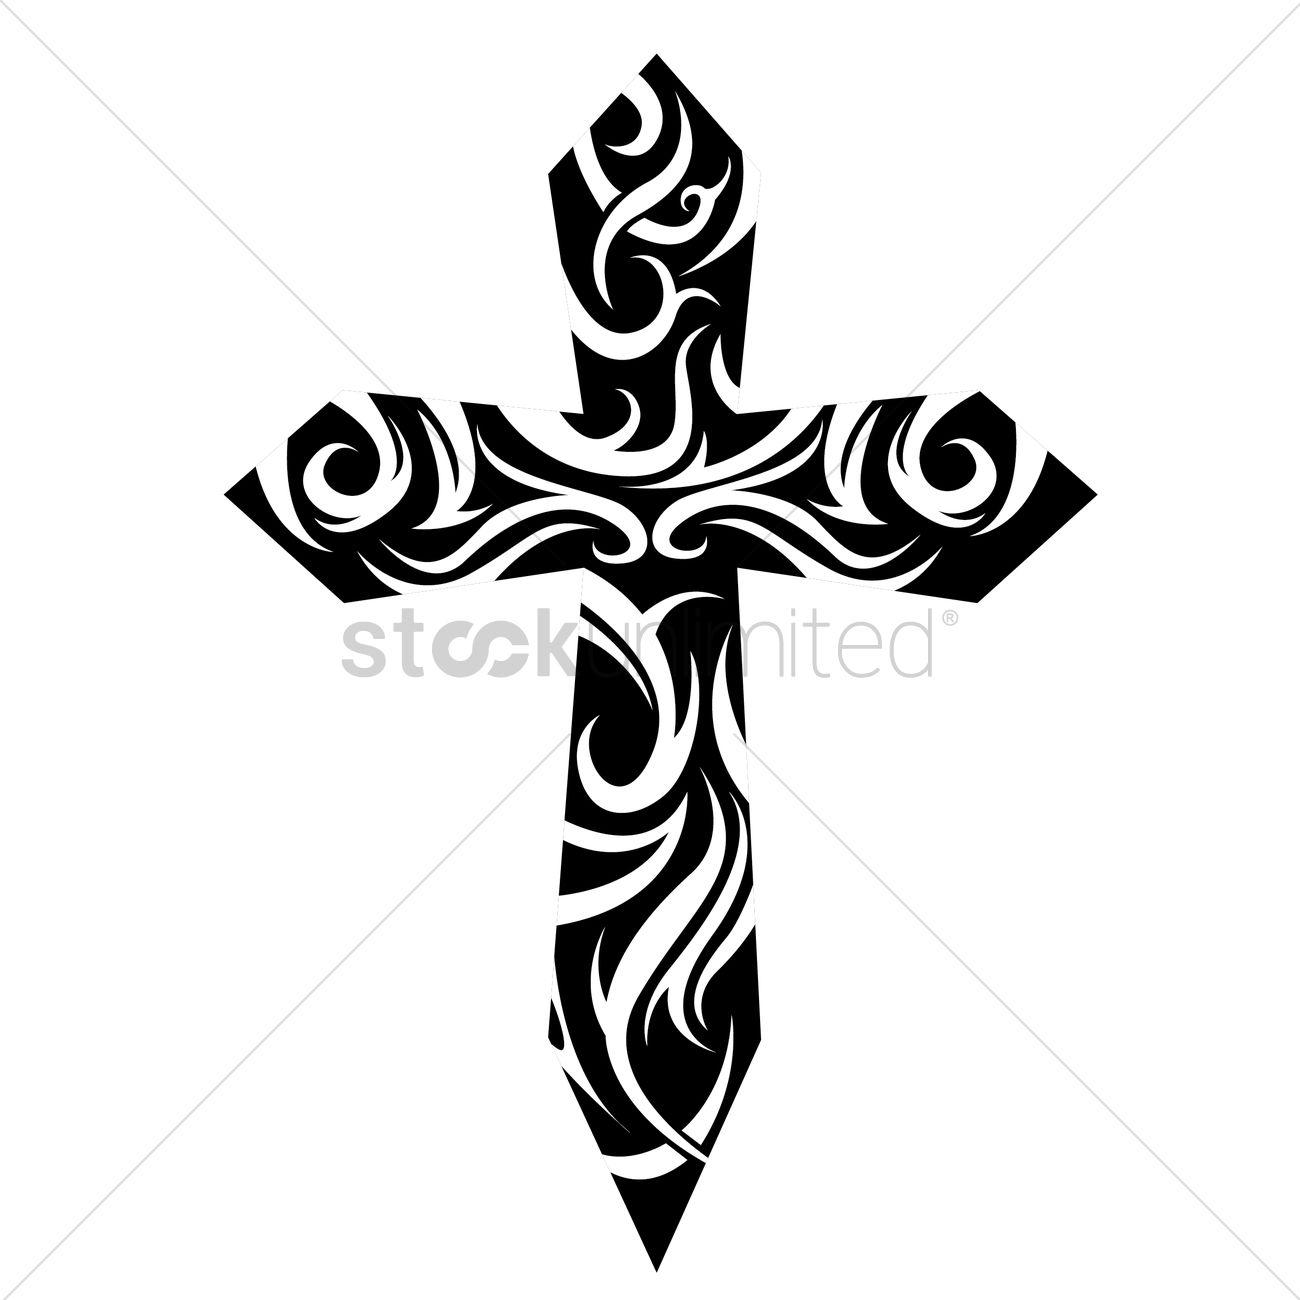 tribal cross tattoo vector image 1524206 stockunlimited. Black Bedroom Furniture Sets. Home Design Ideas